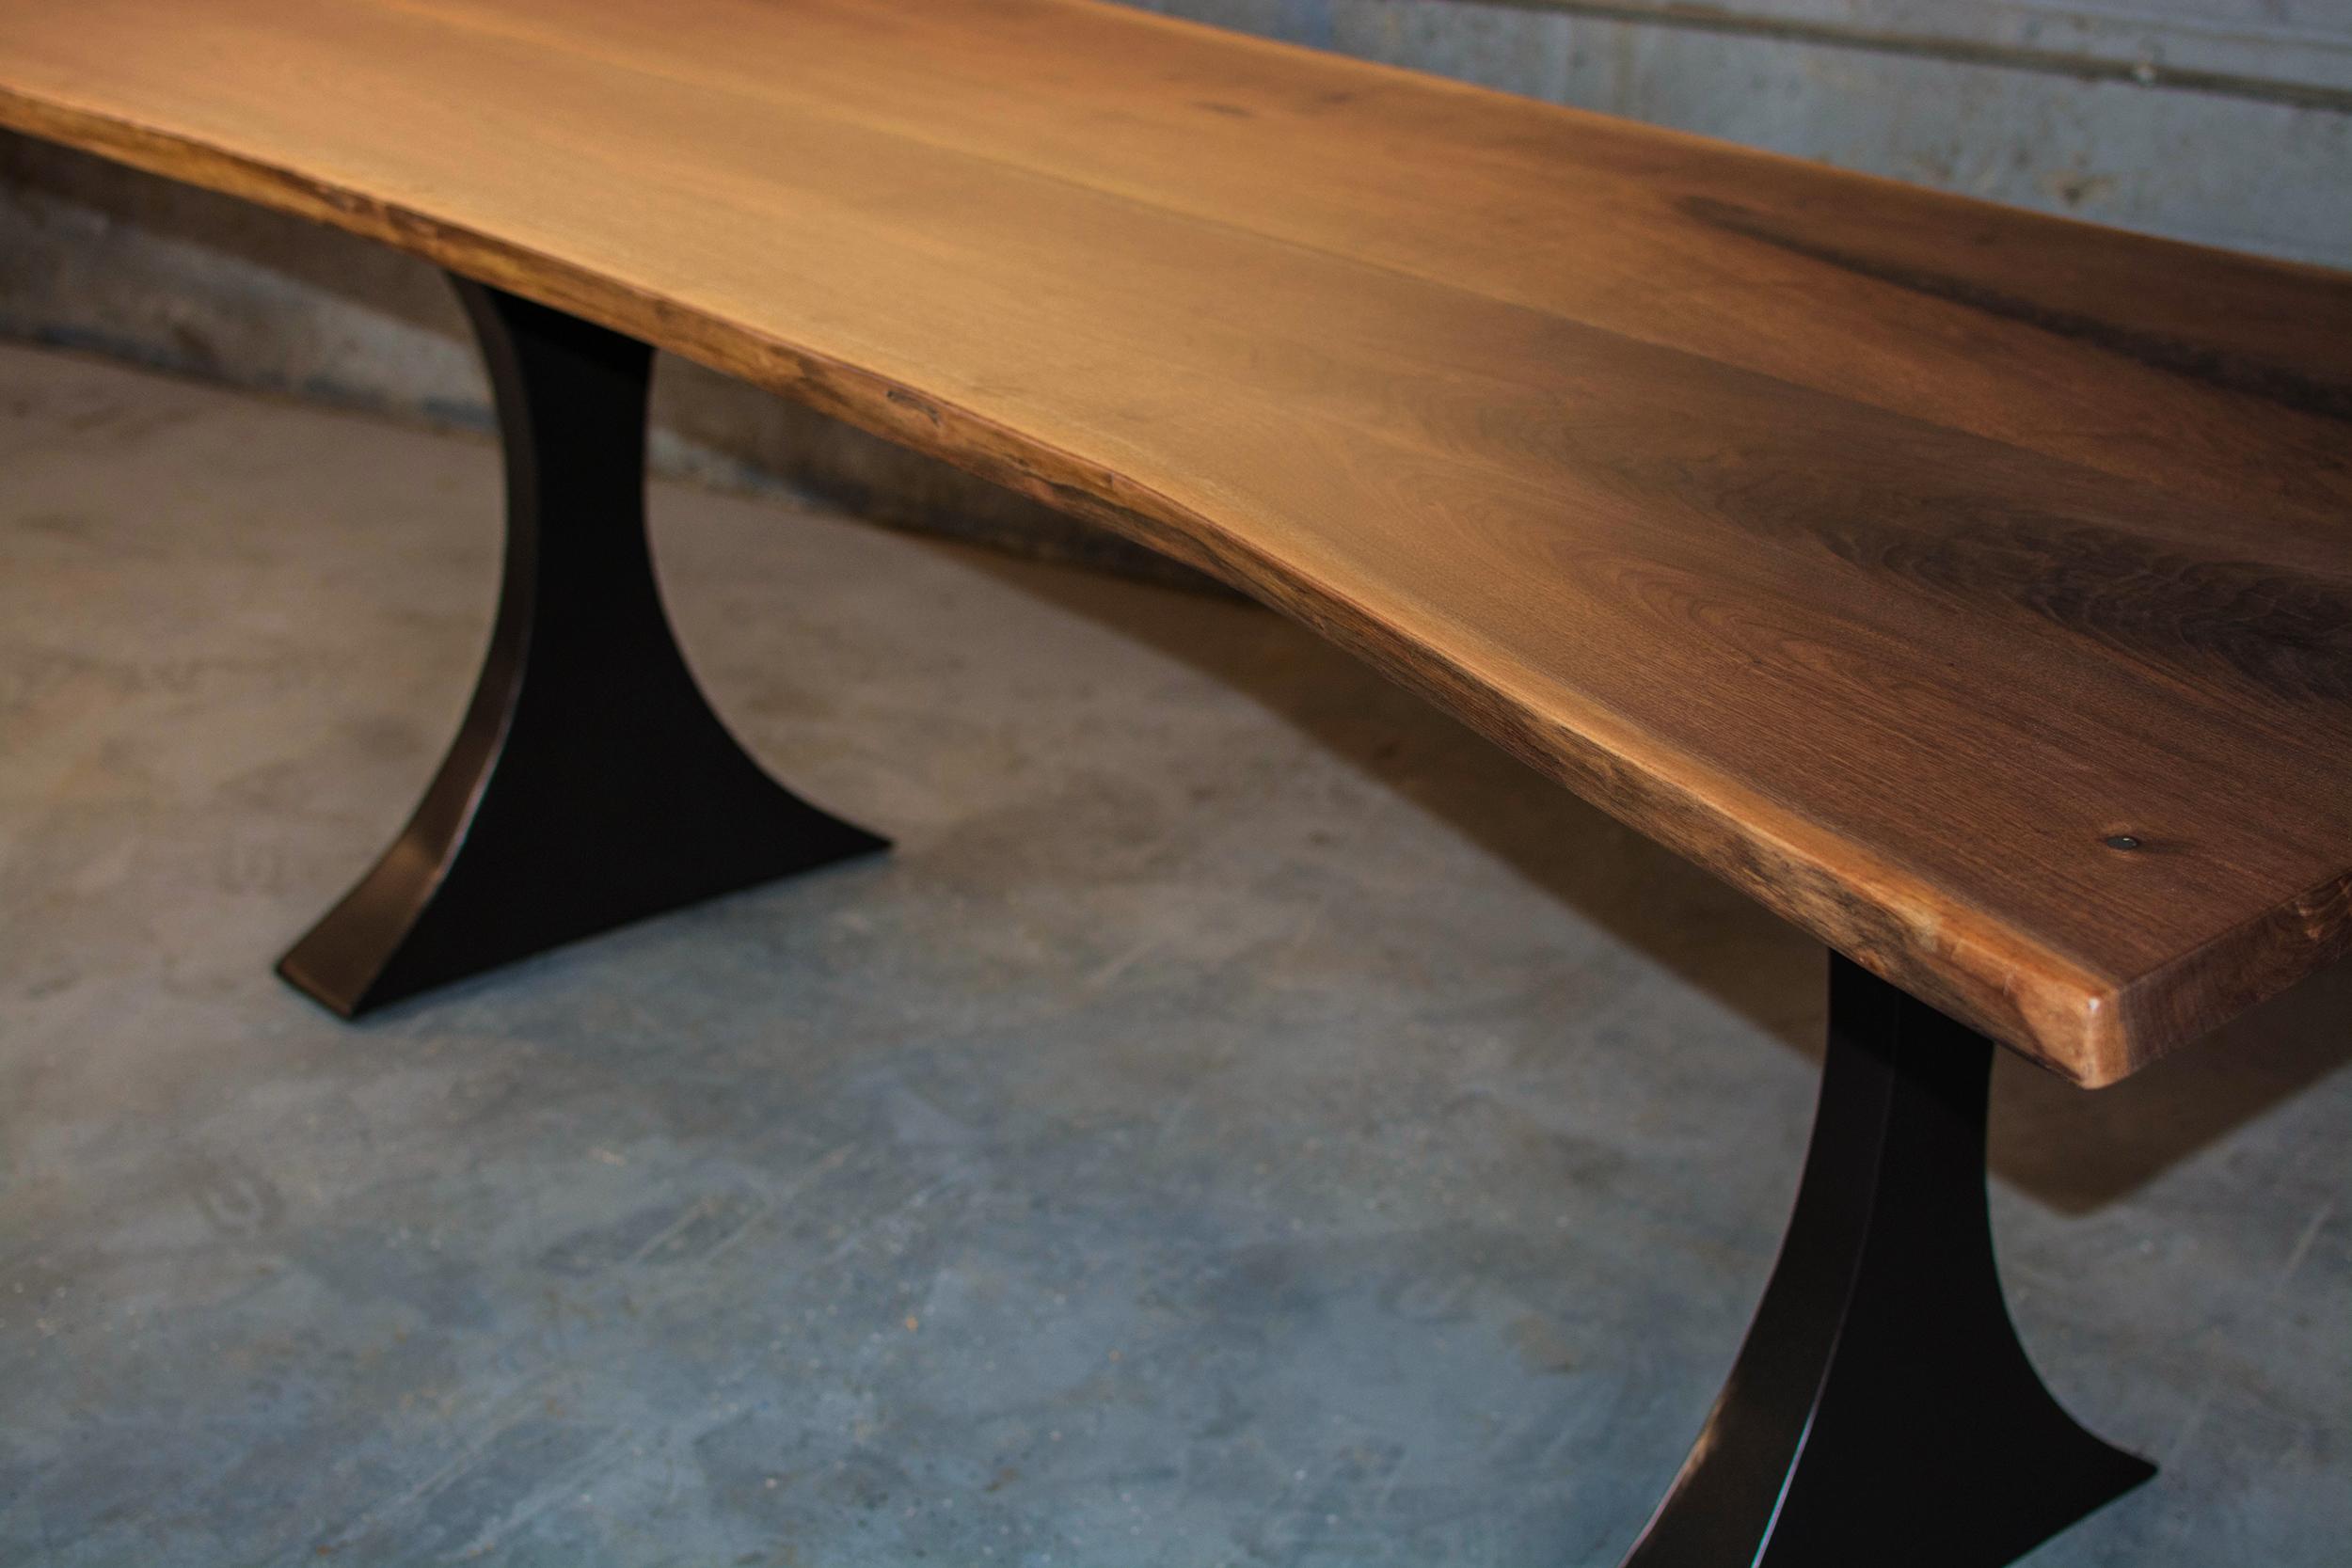 hank_walnutdlab-dining-table-close.jpg